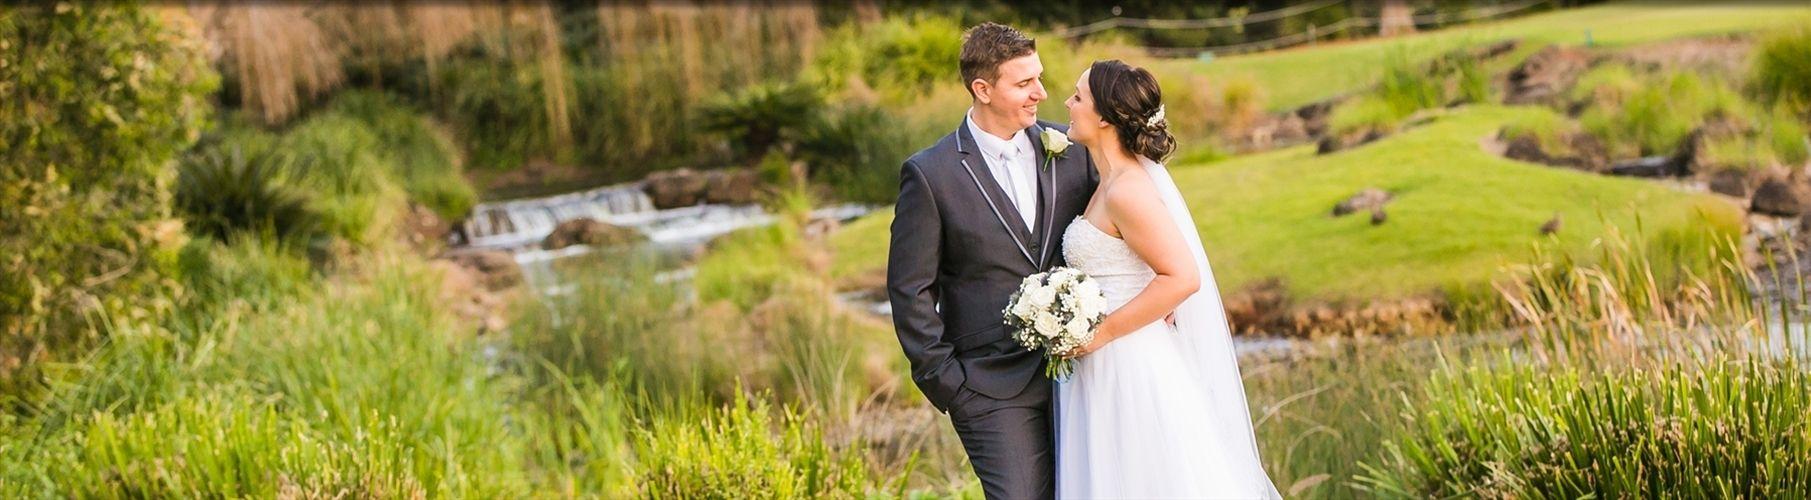 Wedding Venue - Lakelands Golf Club 23 on Veilability